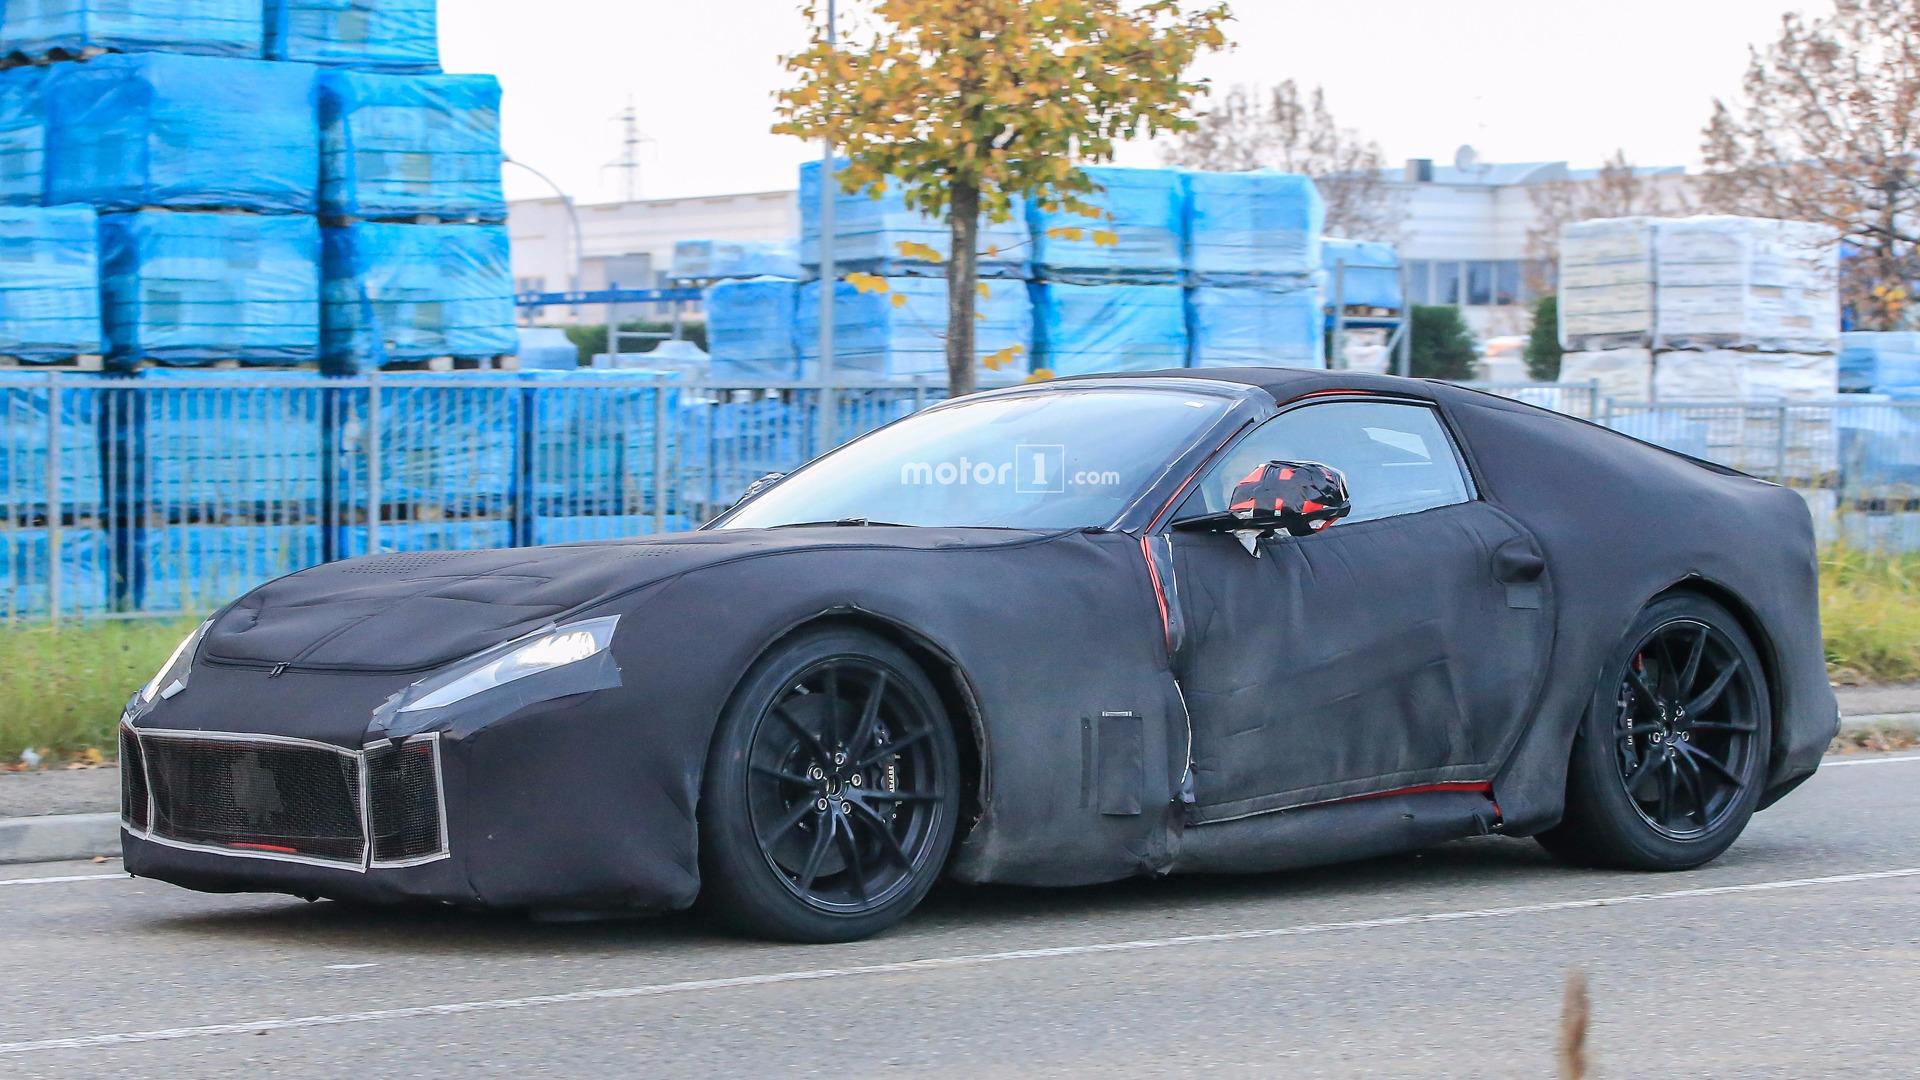 The Alleged 800 Hp Ferrari F12 M Will Debut In Geneva